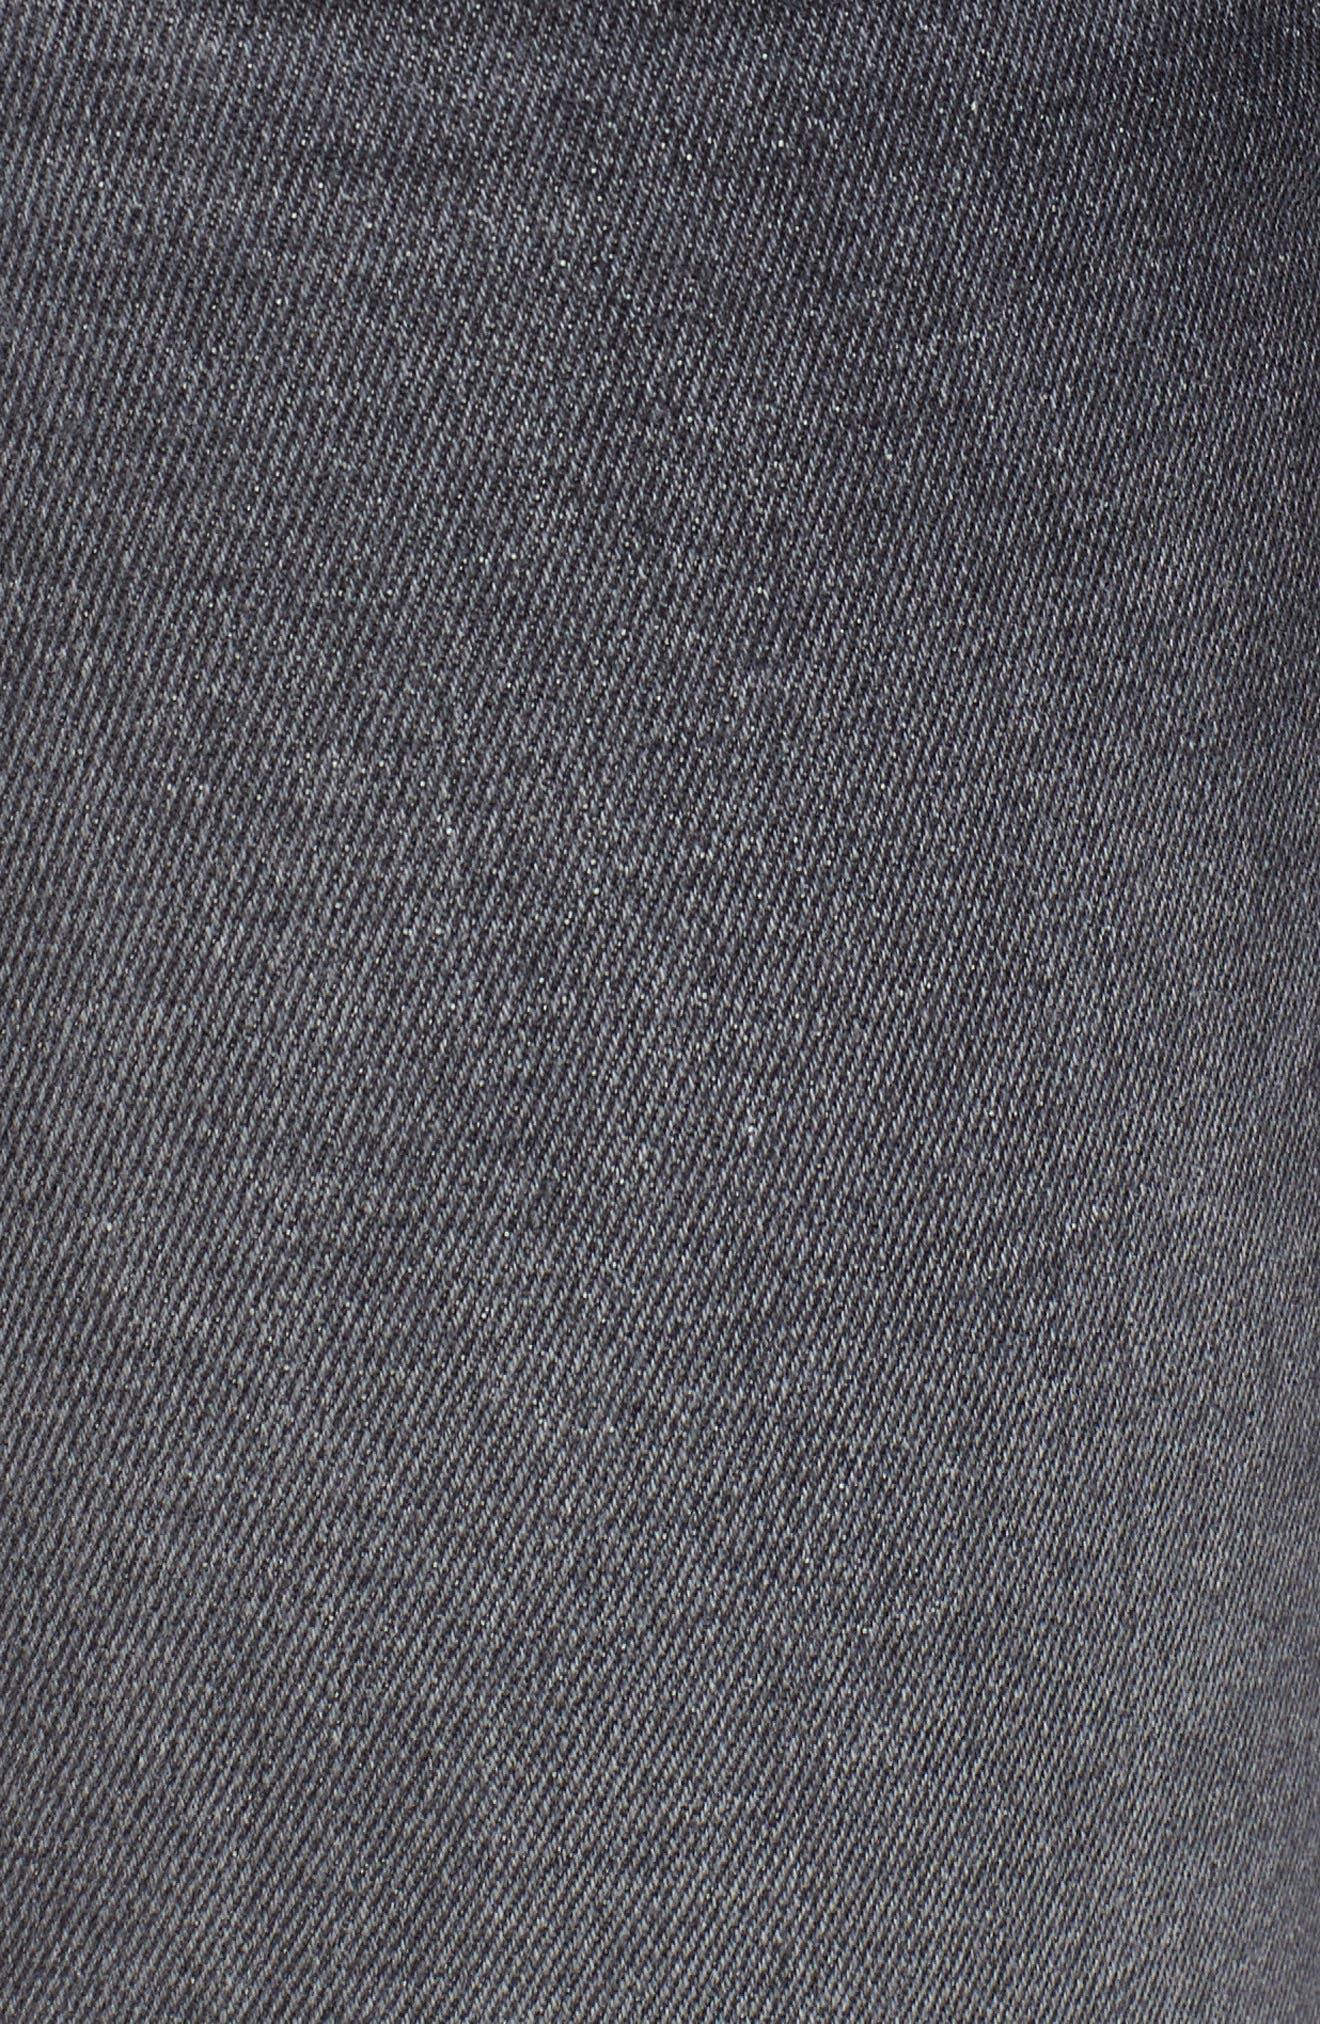 Alternate Image 5  - Hudson Jeans Zoeey High Waist Cutoff Boyfriend Shorts (Malice)